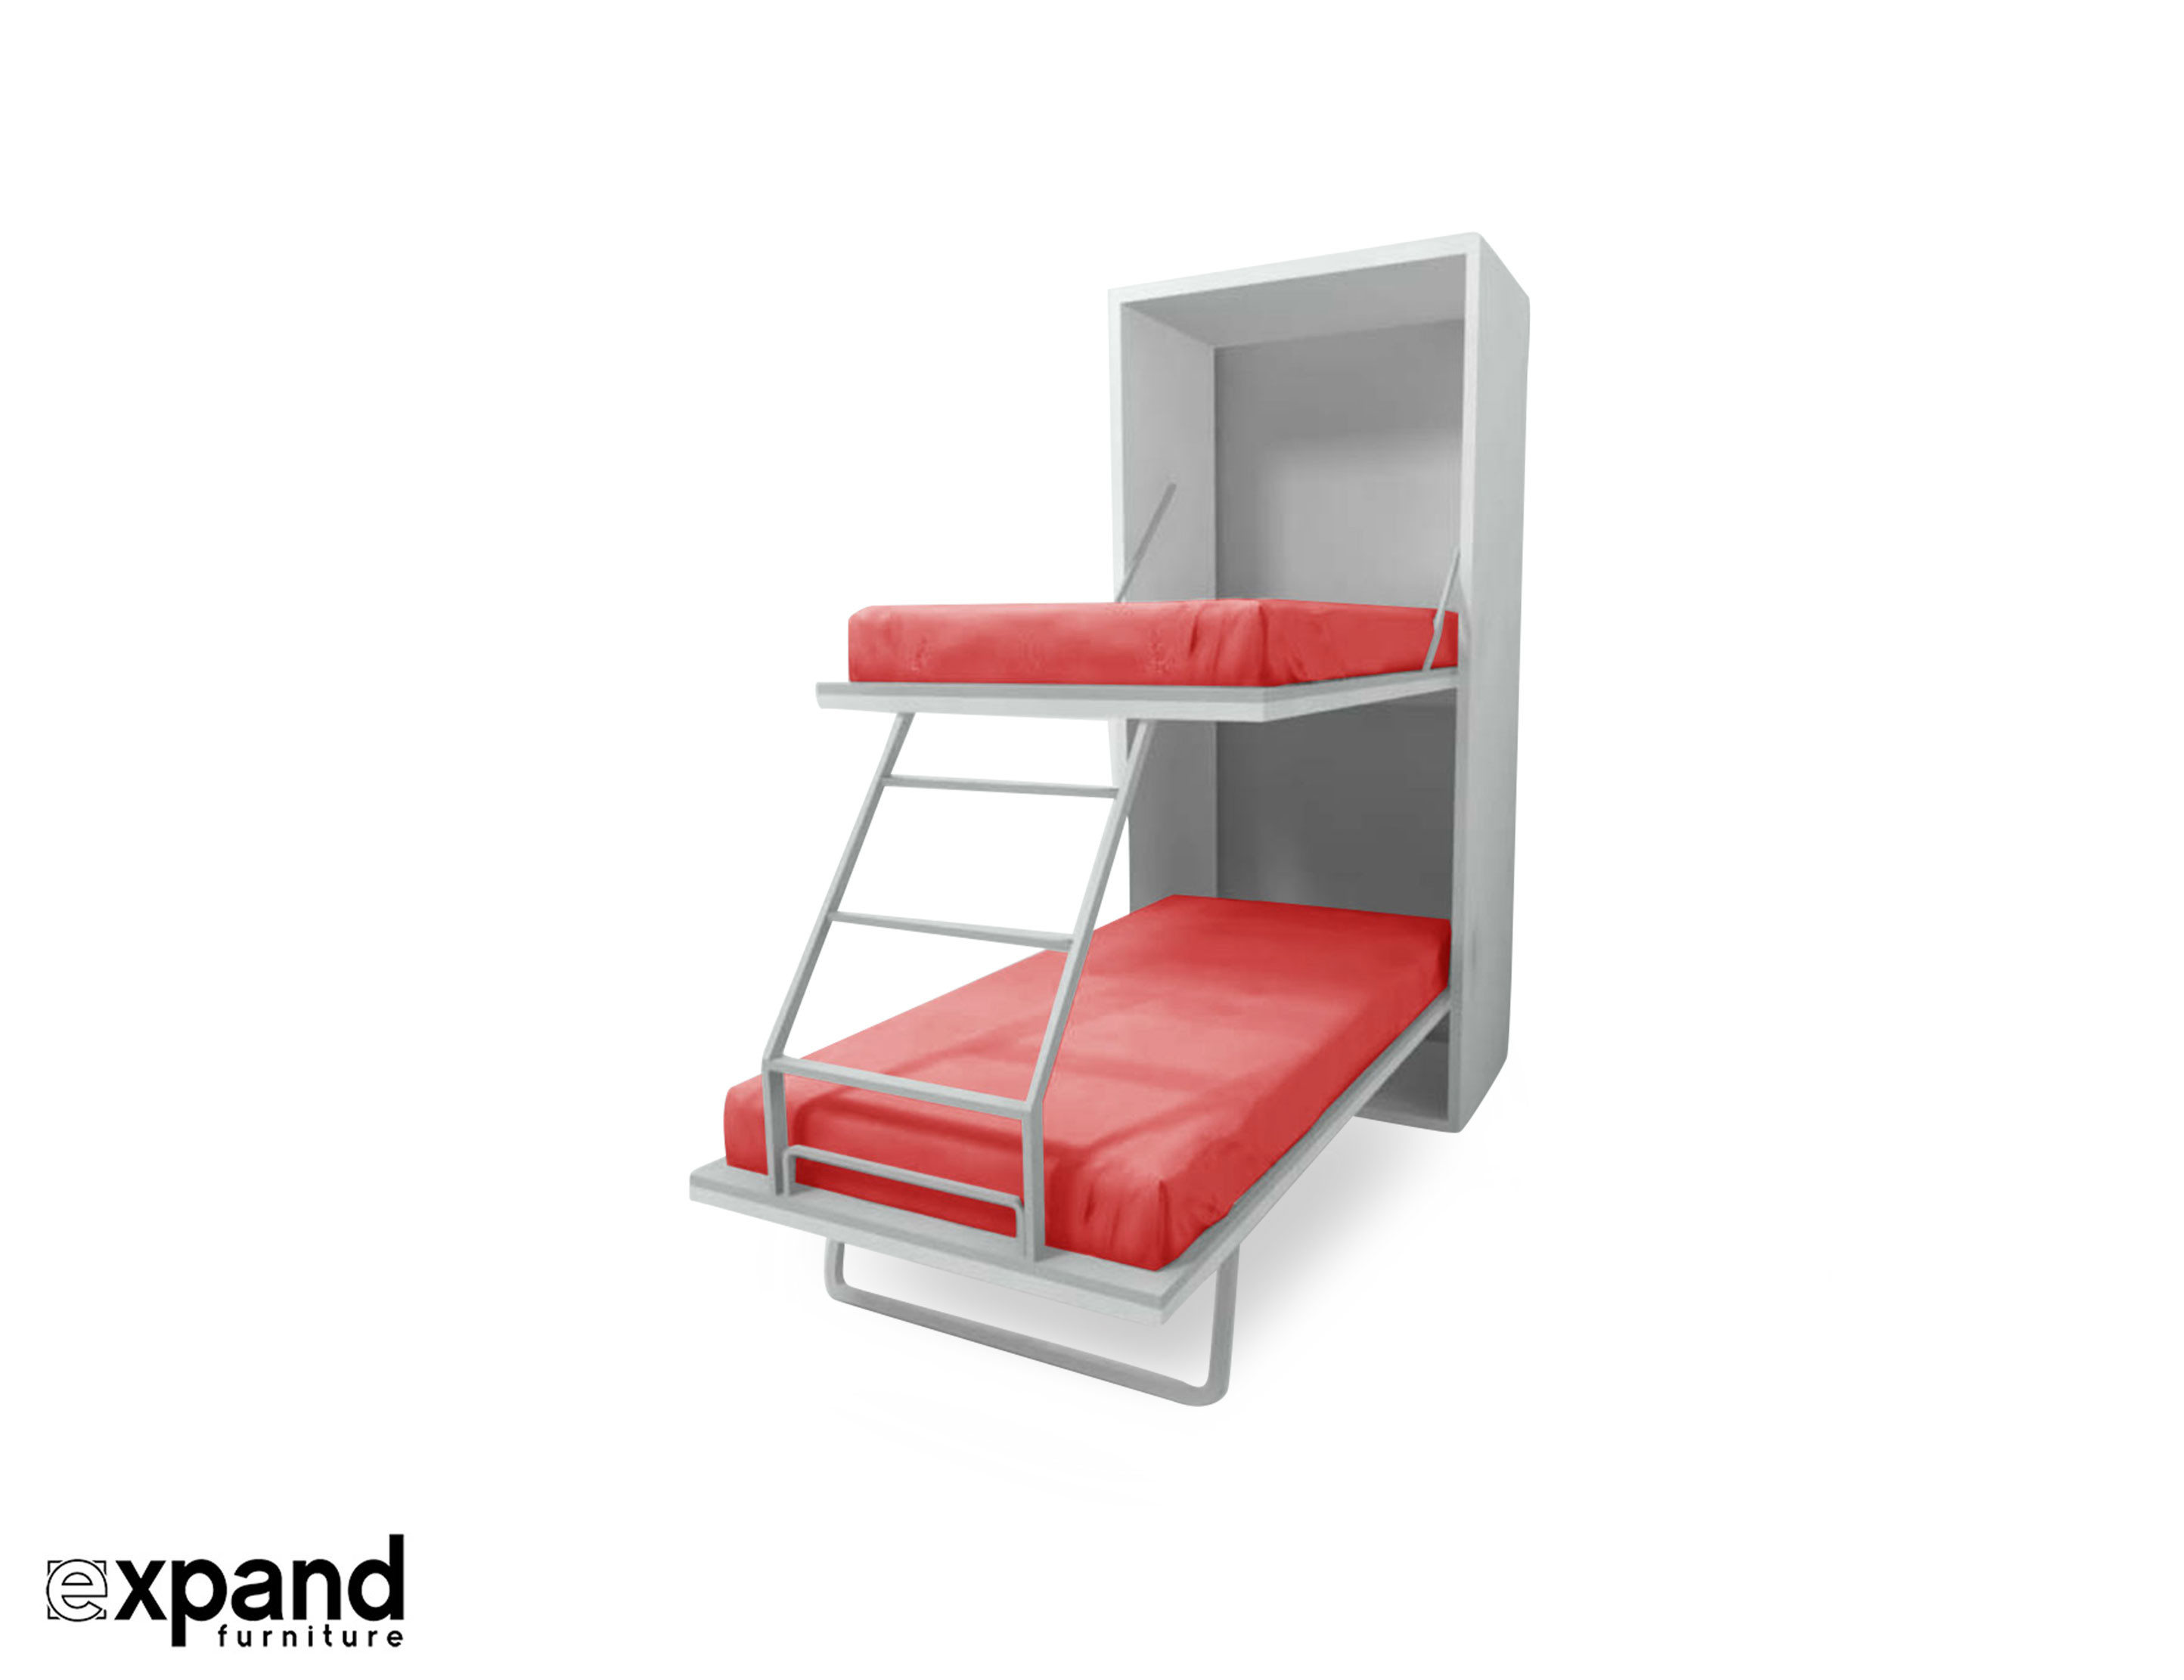 Compatto Hidden Vertical Murphy Bunk Beds Expand Furniture